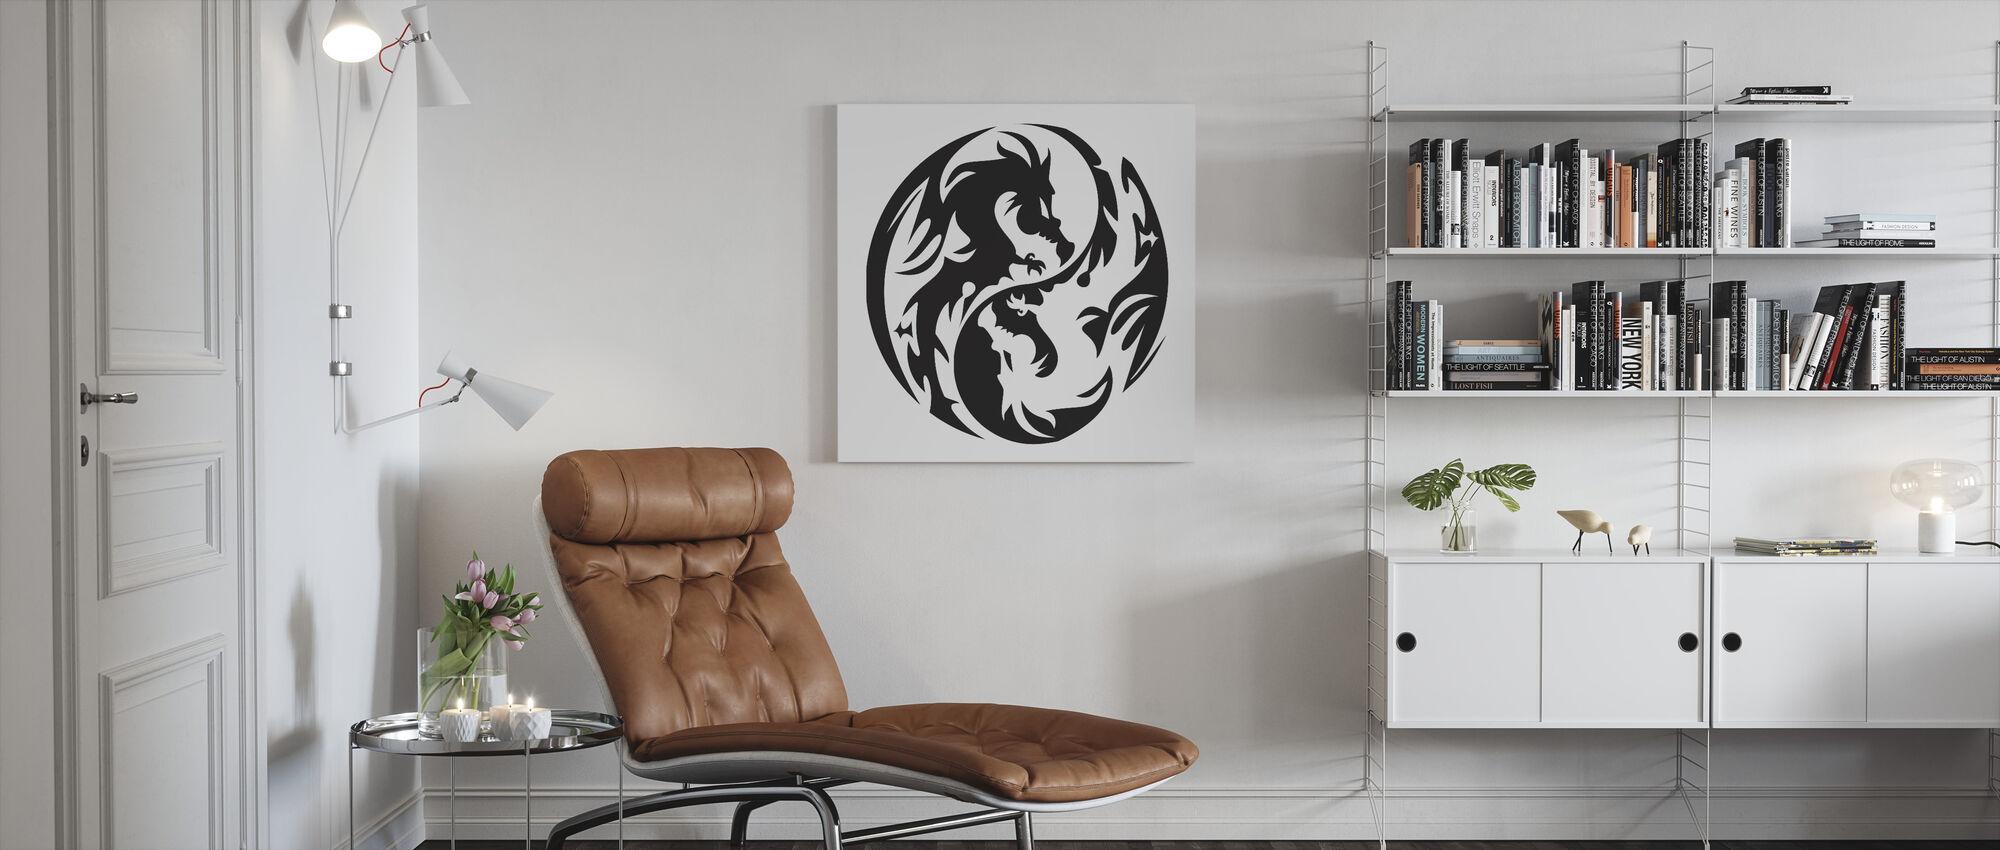 Circle Dragons - Canvas print - Living Room